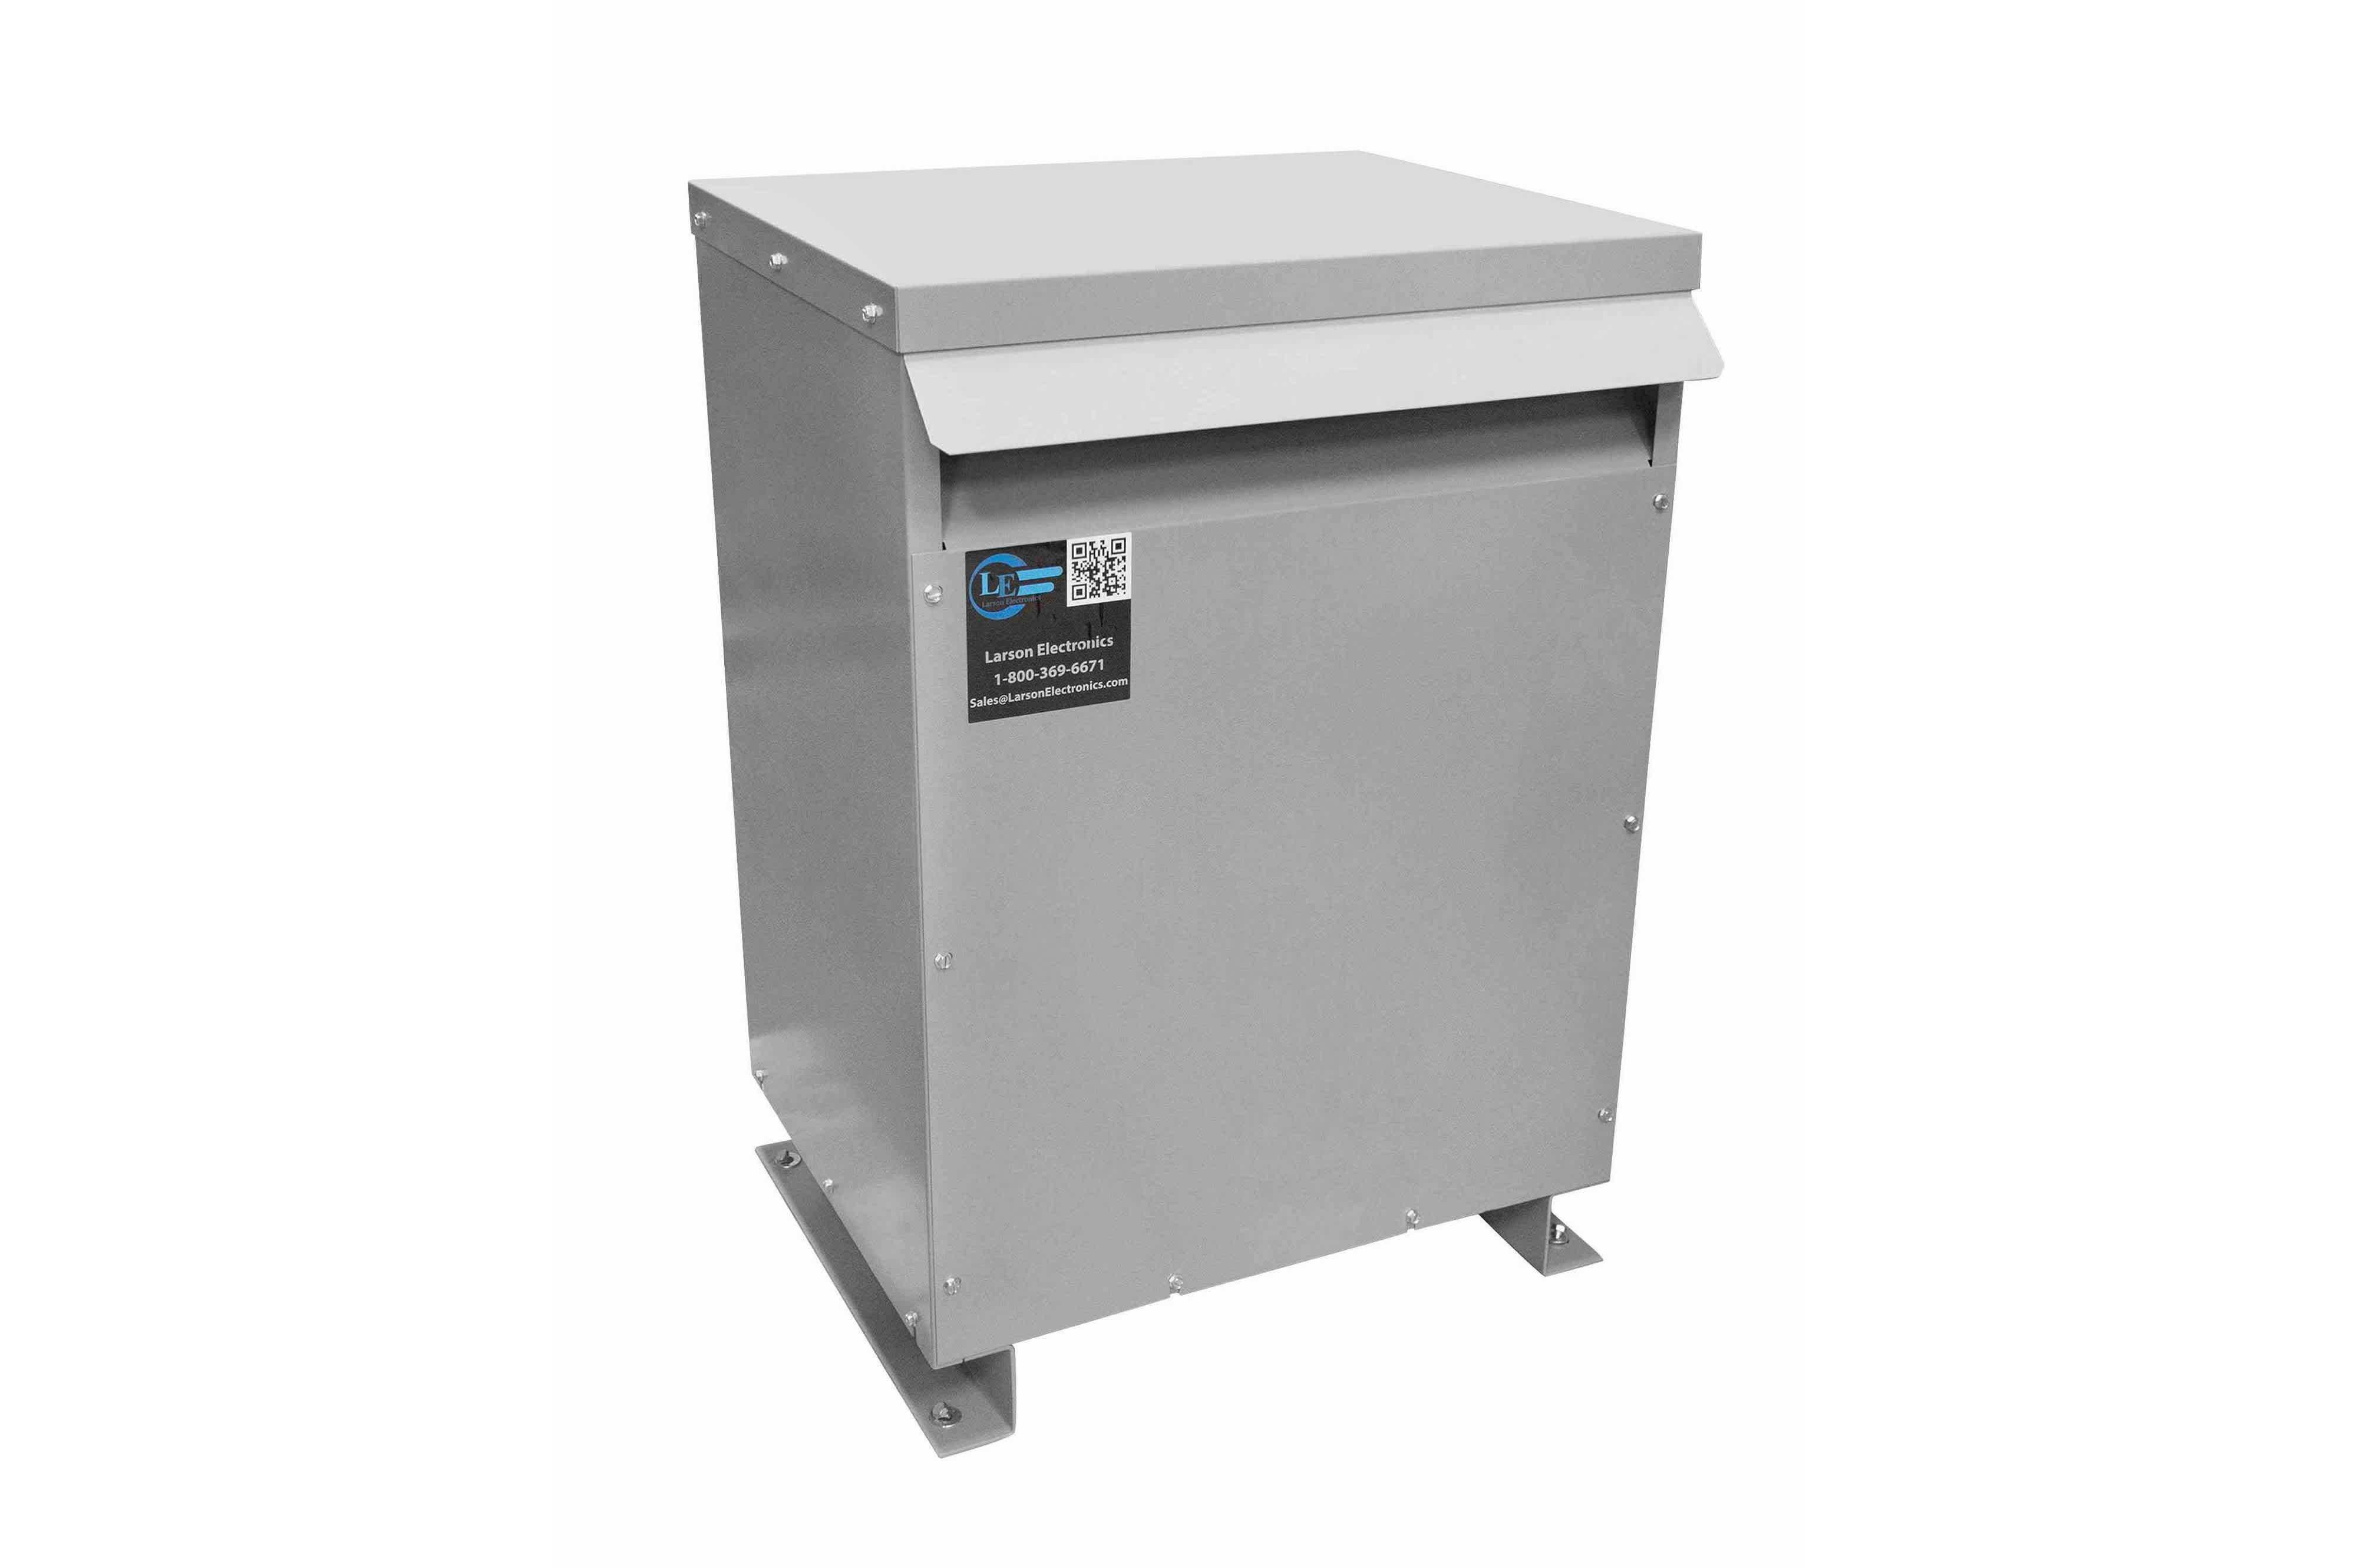 70 kVA 3PH Isolation Transformer, 460V Wye Primary, 380Y/220 Wye-N Secondary, N3R, Ventilated, 60 Hz